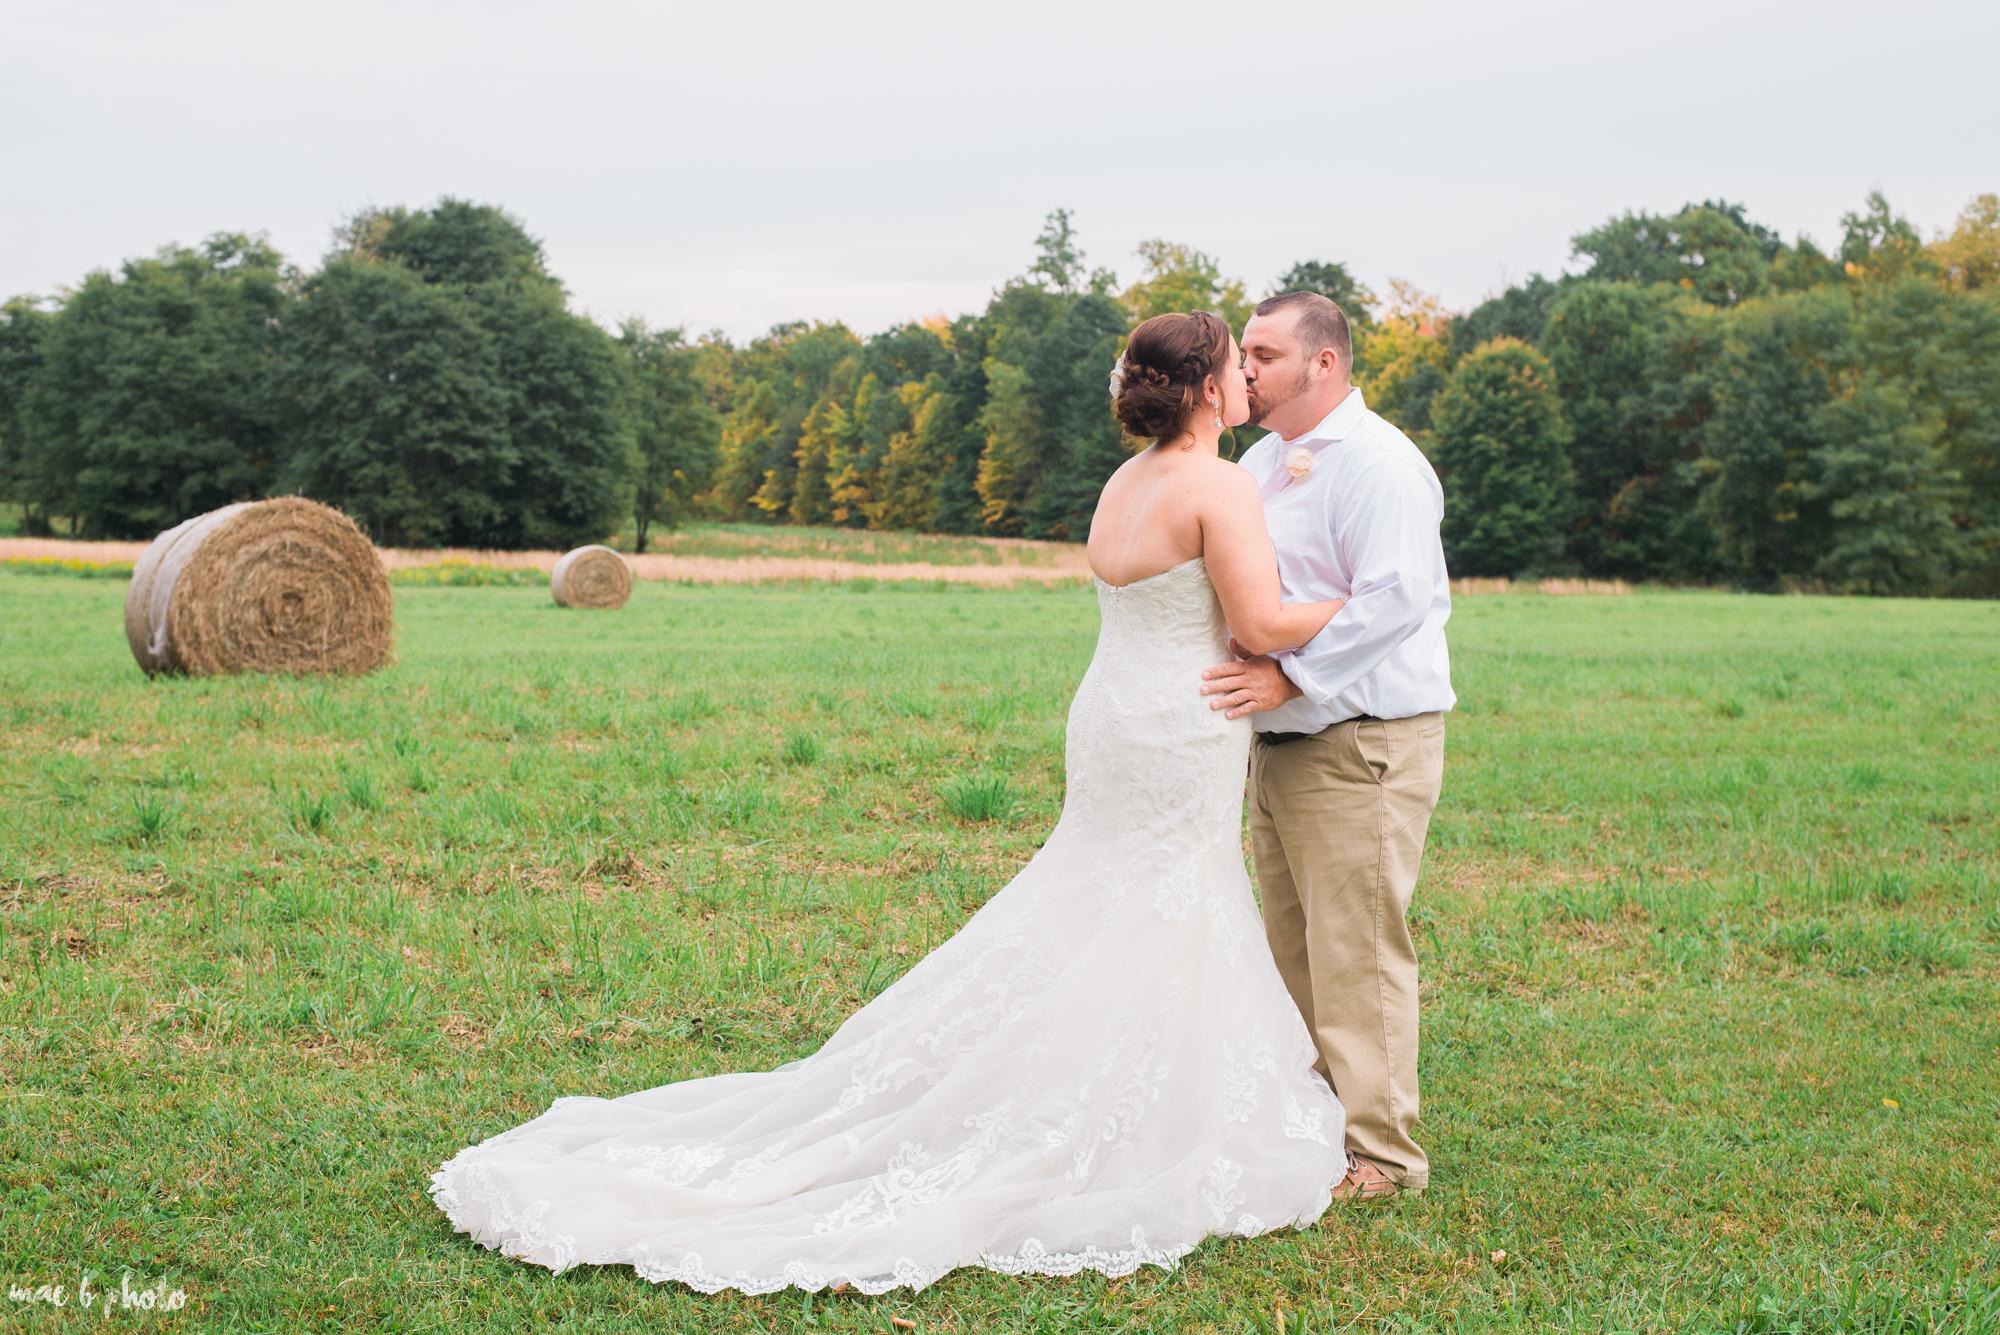 Sarah & Dustin's Rustic Chic Barn Wedding at Hartford Hill Winery in Hartford, Ohio by Mae B Photo-64.jpg